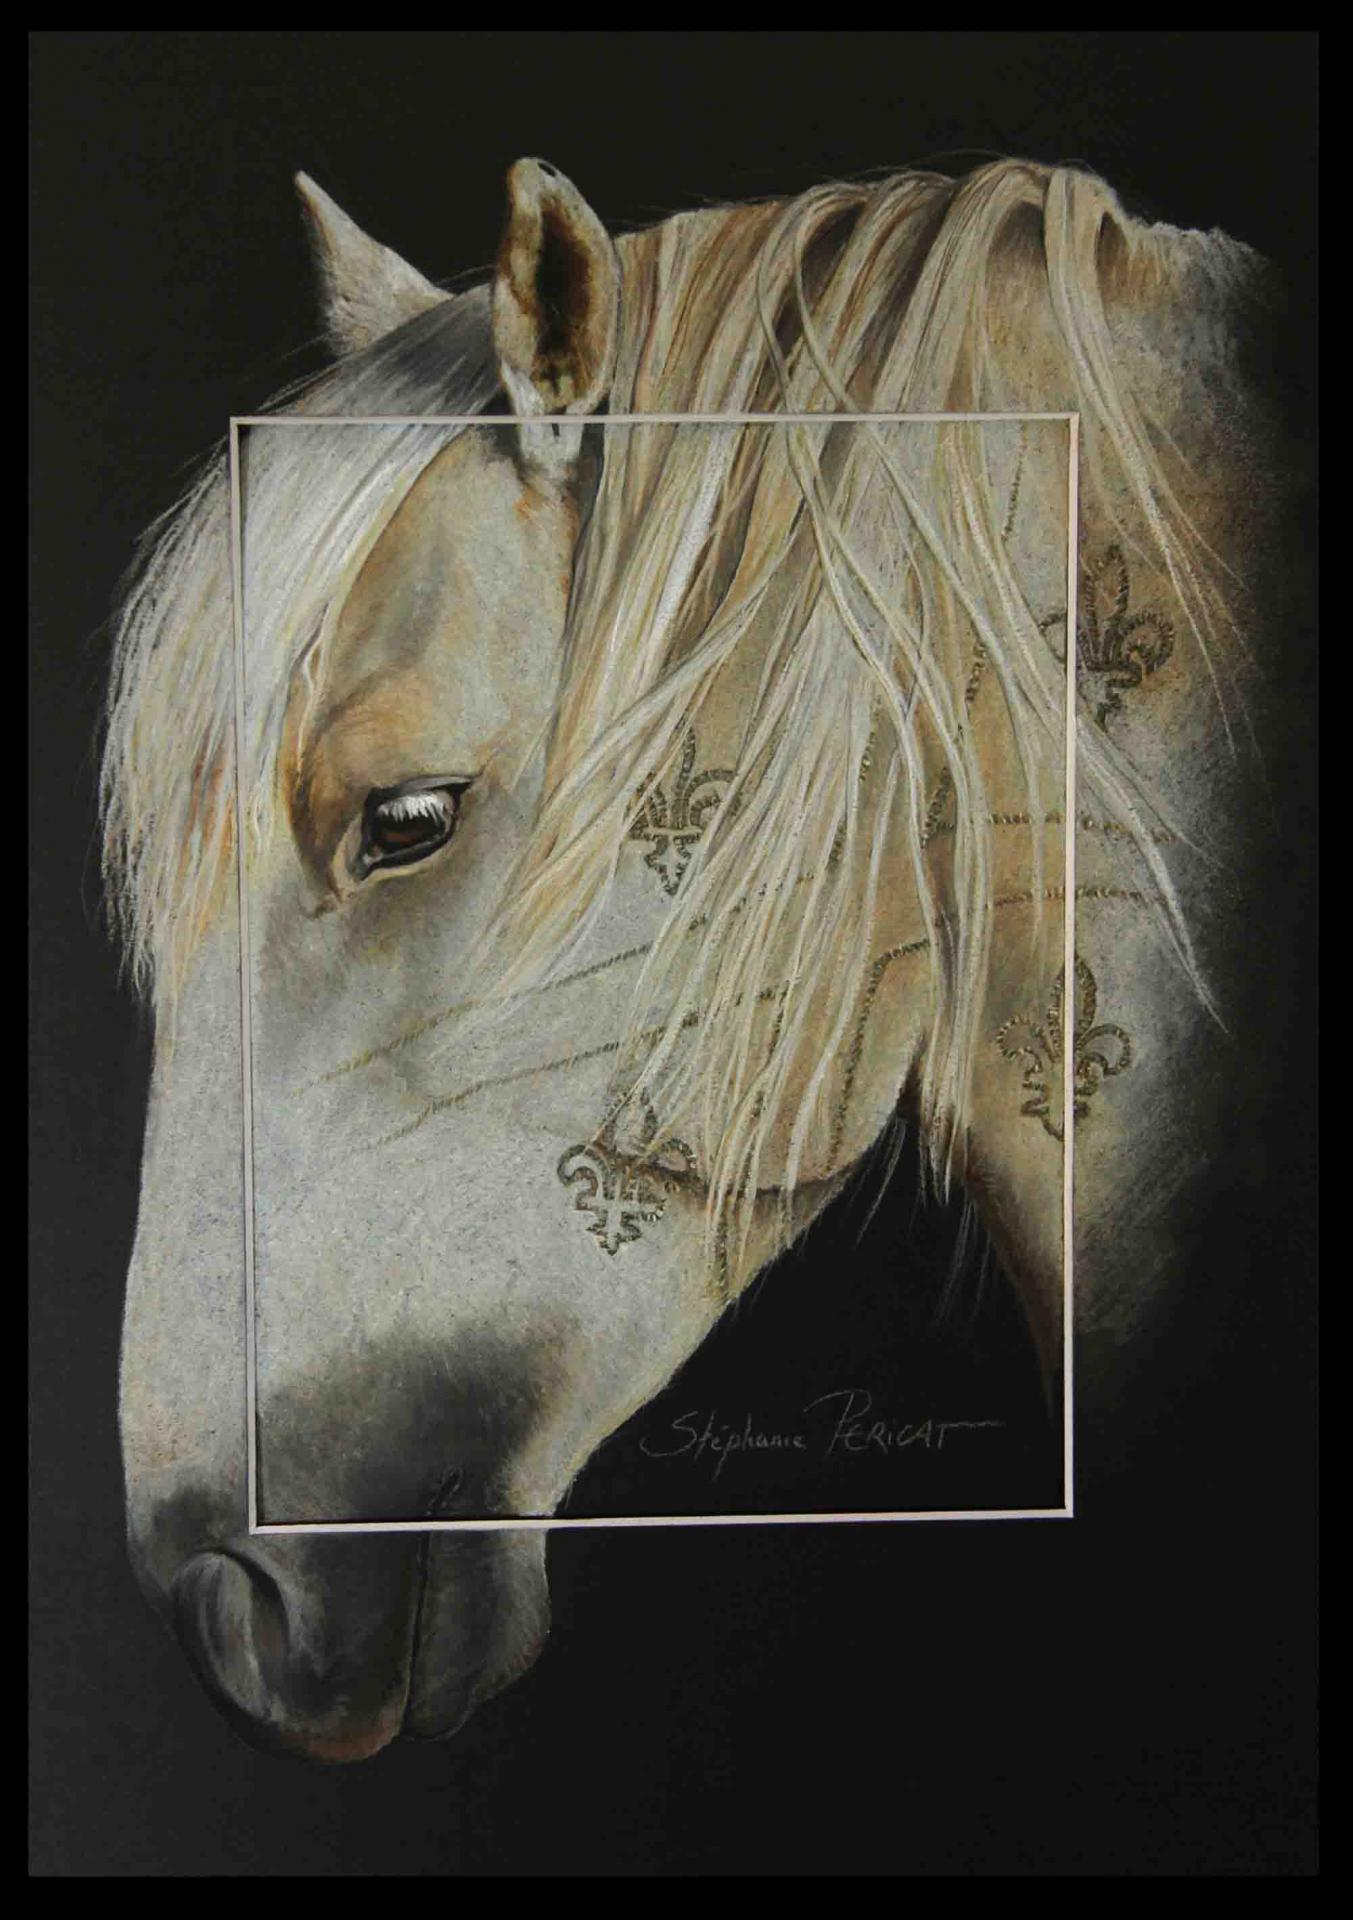 LOU PAIS NADJA ALIAS (Canadian stallion) - pastel sec (soft pastel) - 30x40cm